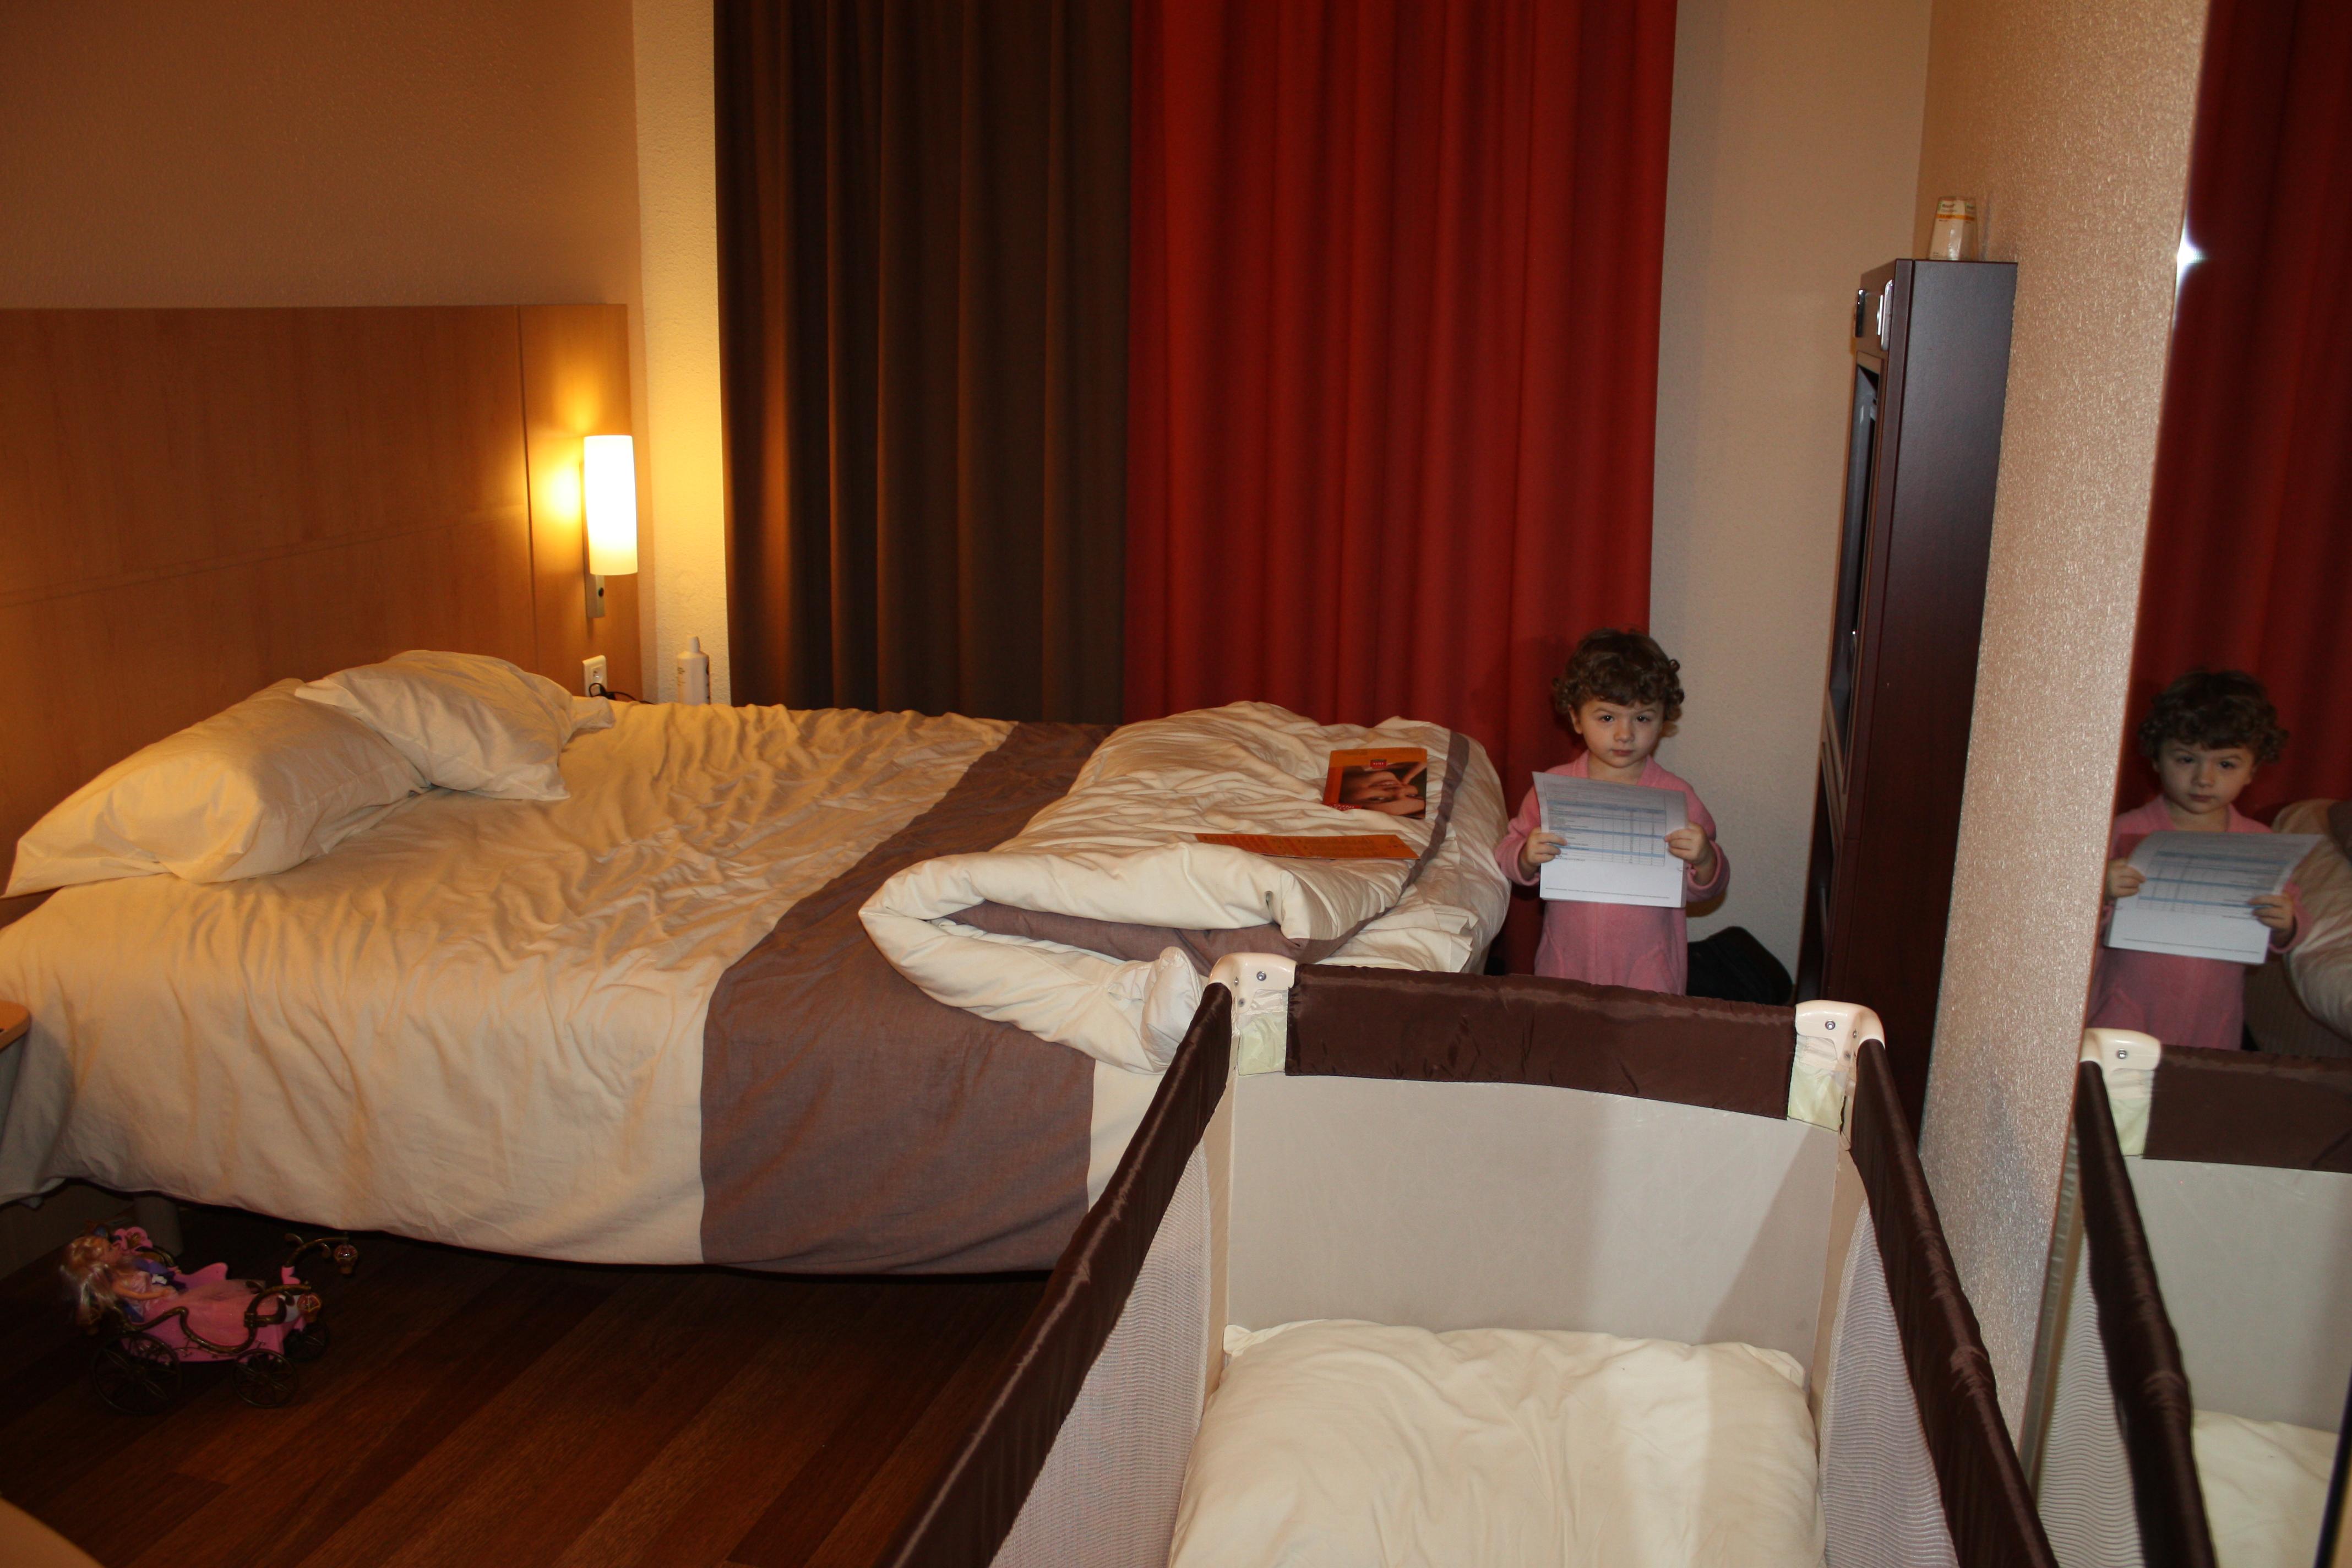 druide journal d 39 une naturopathe. Black Bedroom Furniture Sets. Home Design Ideas